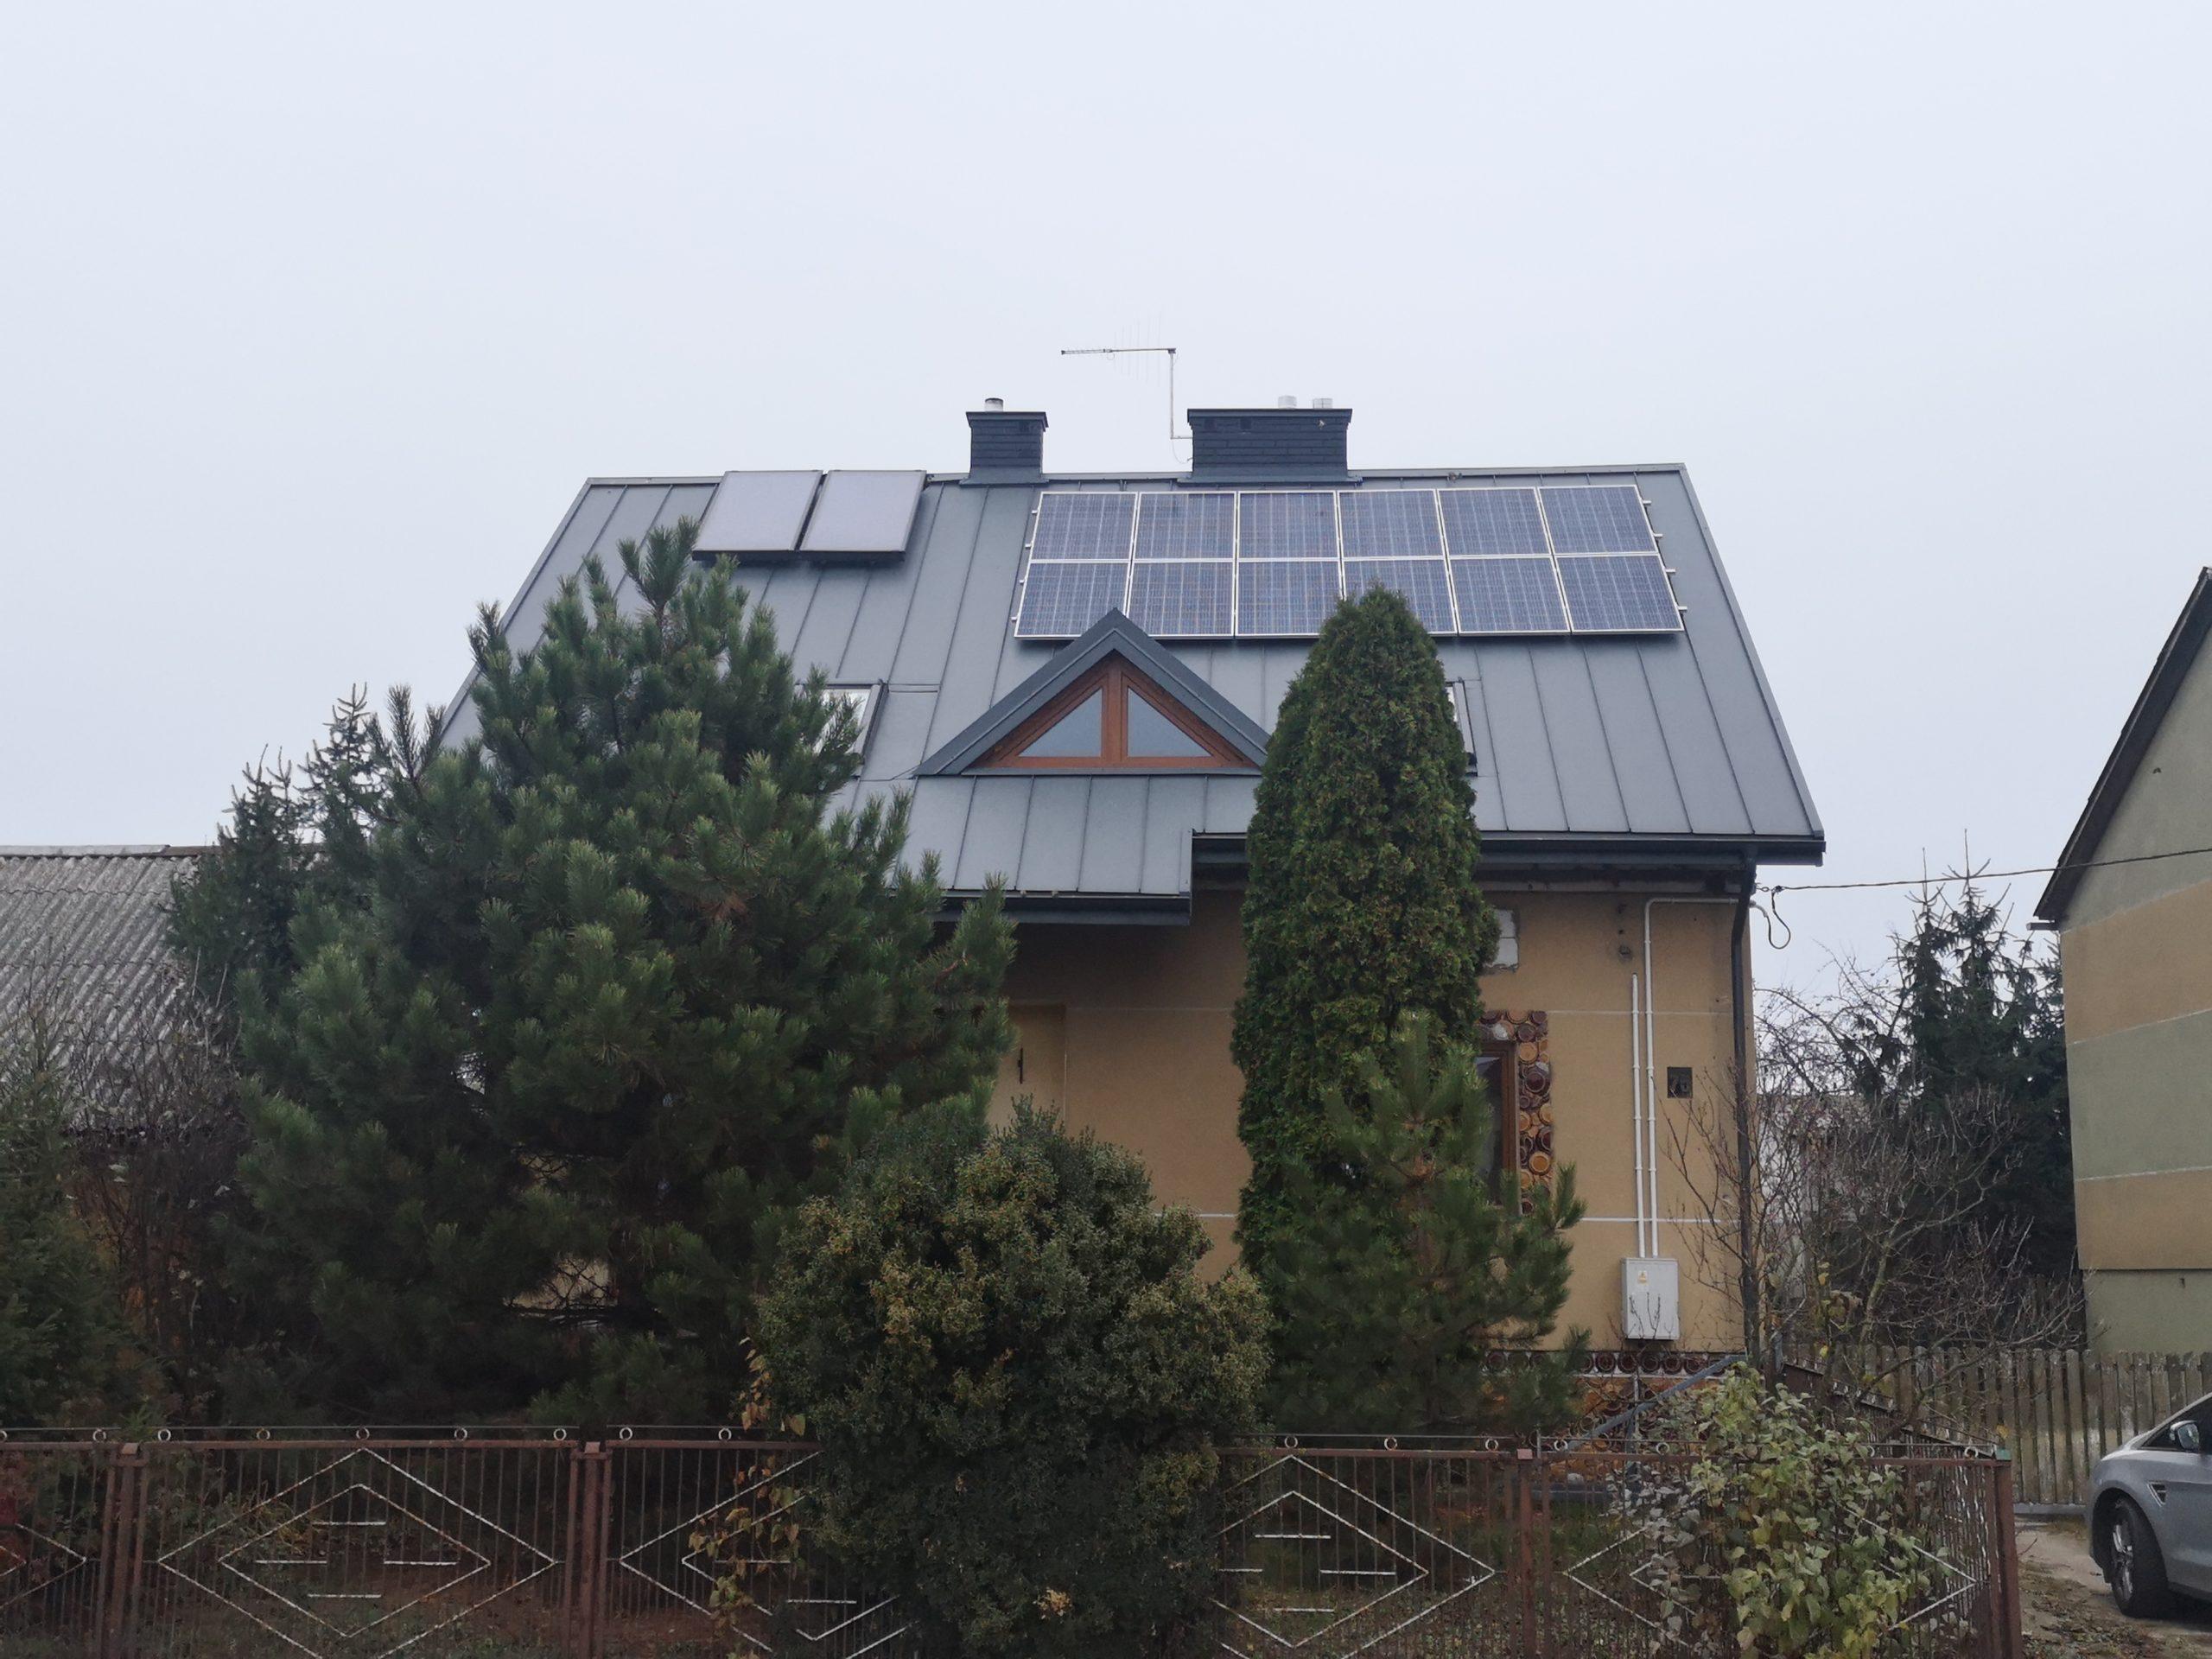 gmina Abramów, ul. Lubartowska - 3,36 kWp